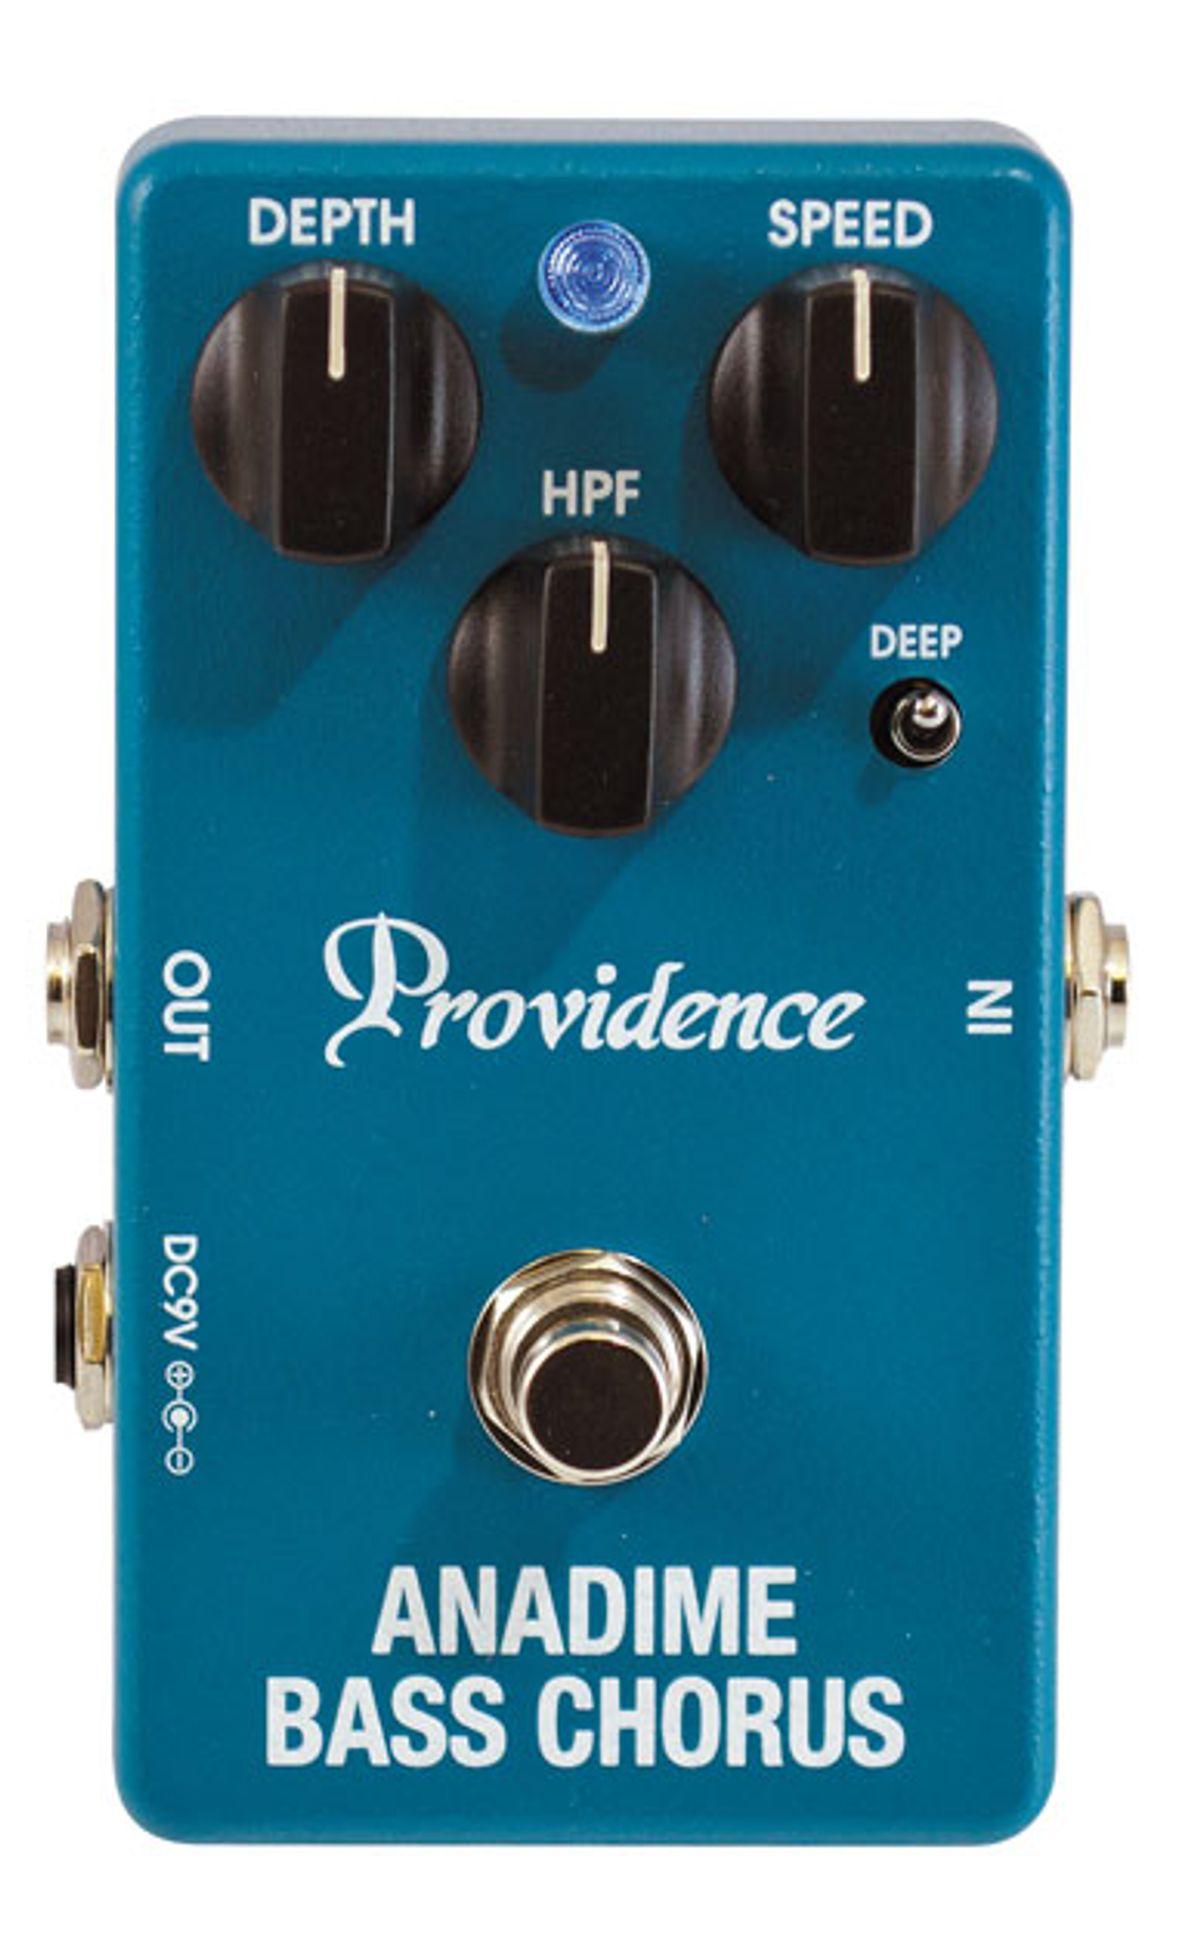 Providence ABC-1 Anadime Bass Chorus Review